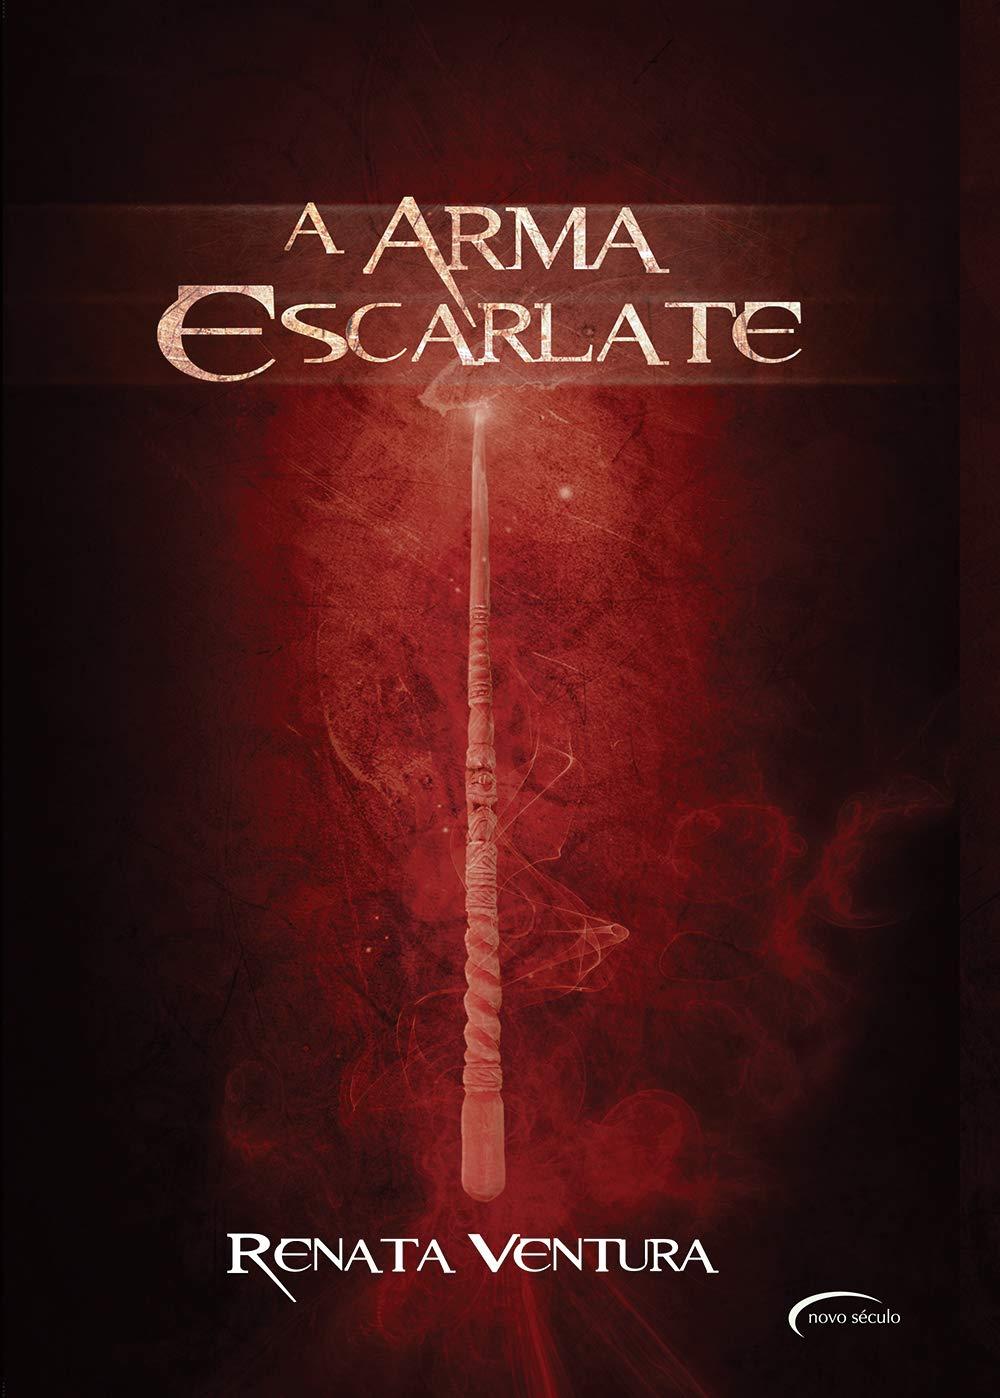 A Arma Escarlate - Renata Ventura